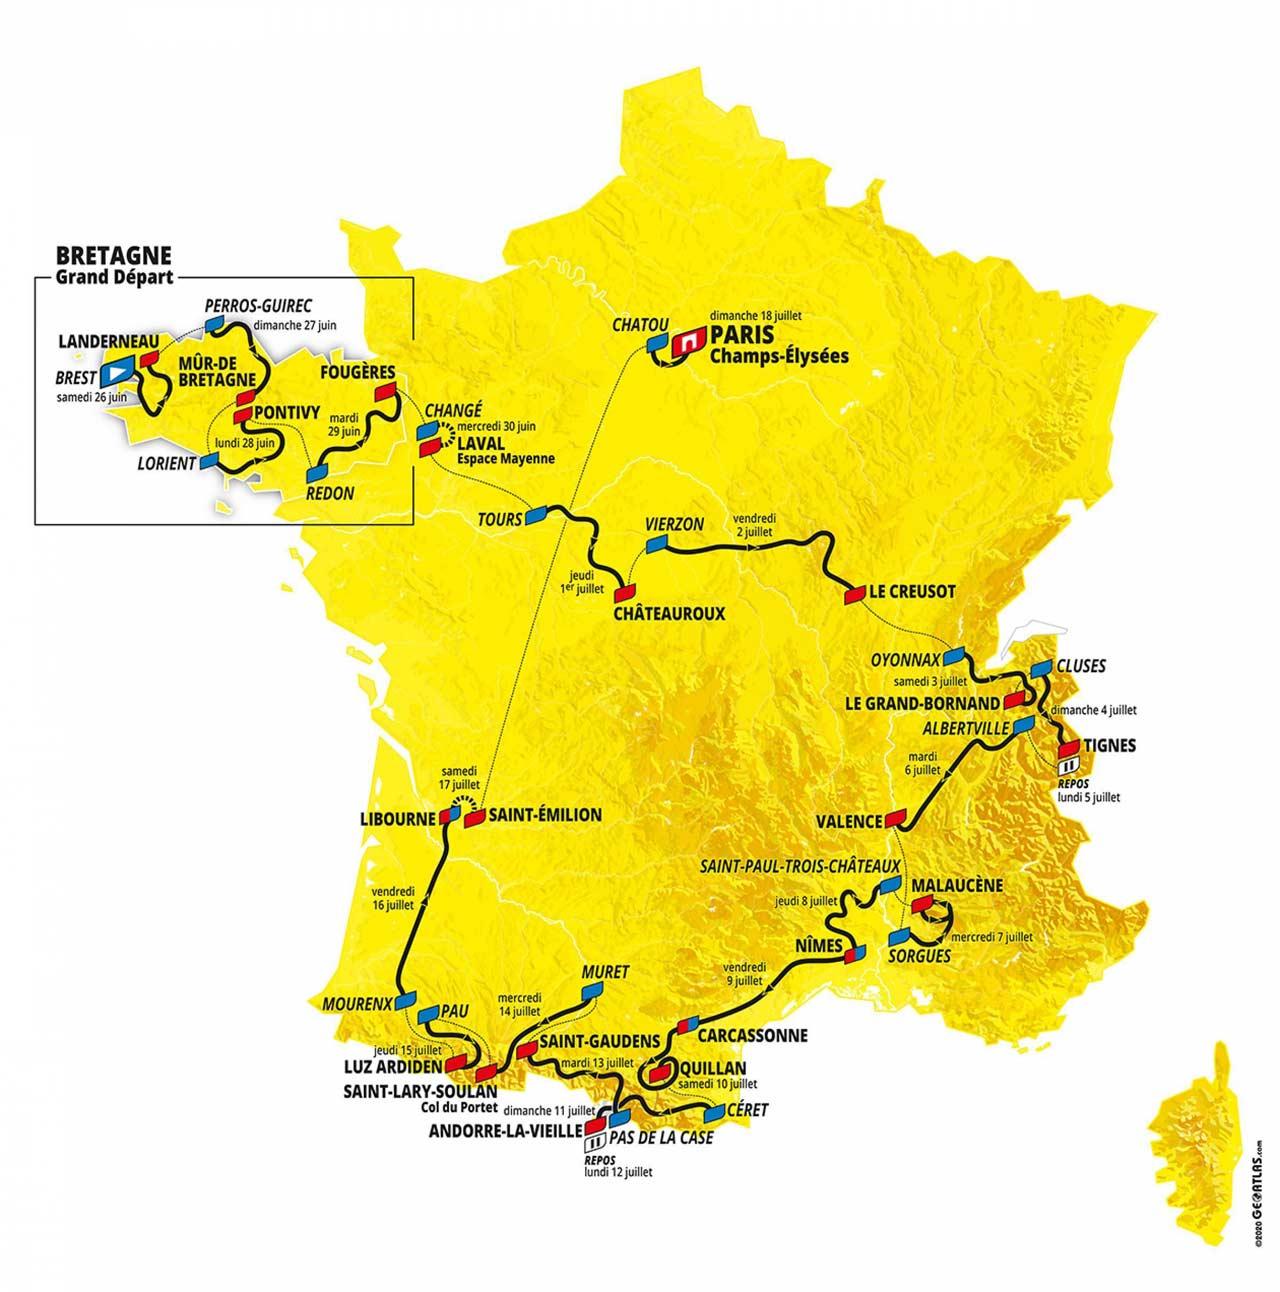 Percurso Tour de France 2021